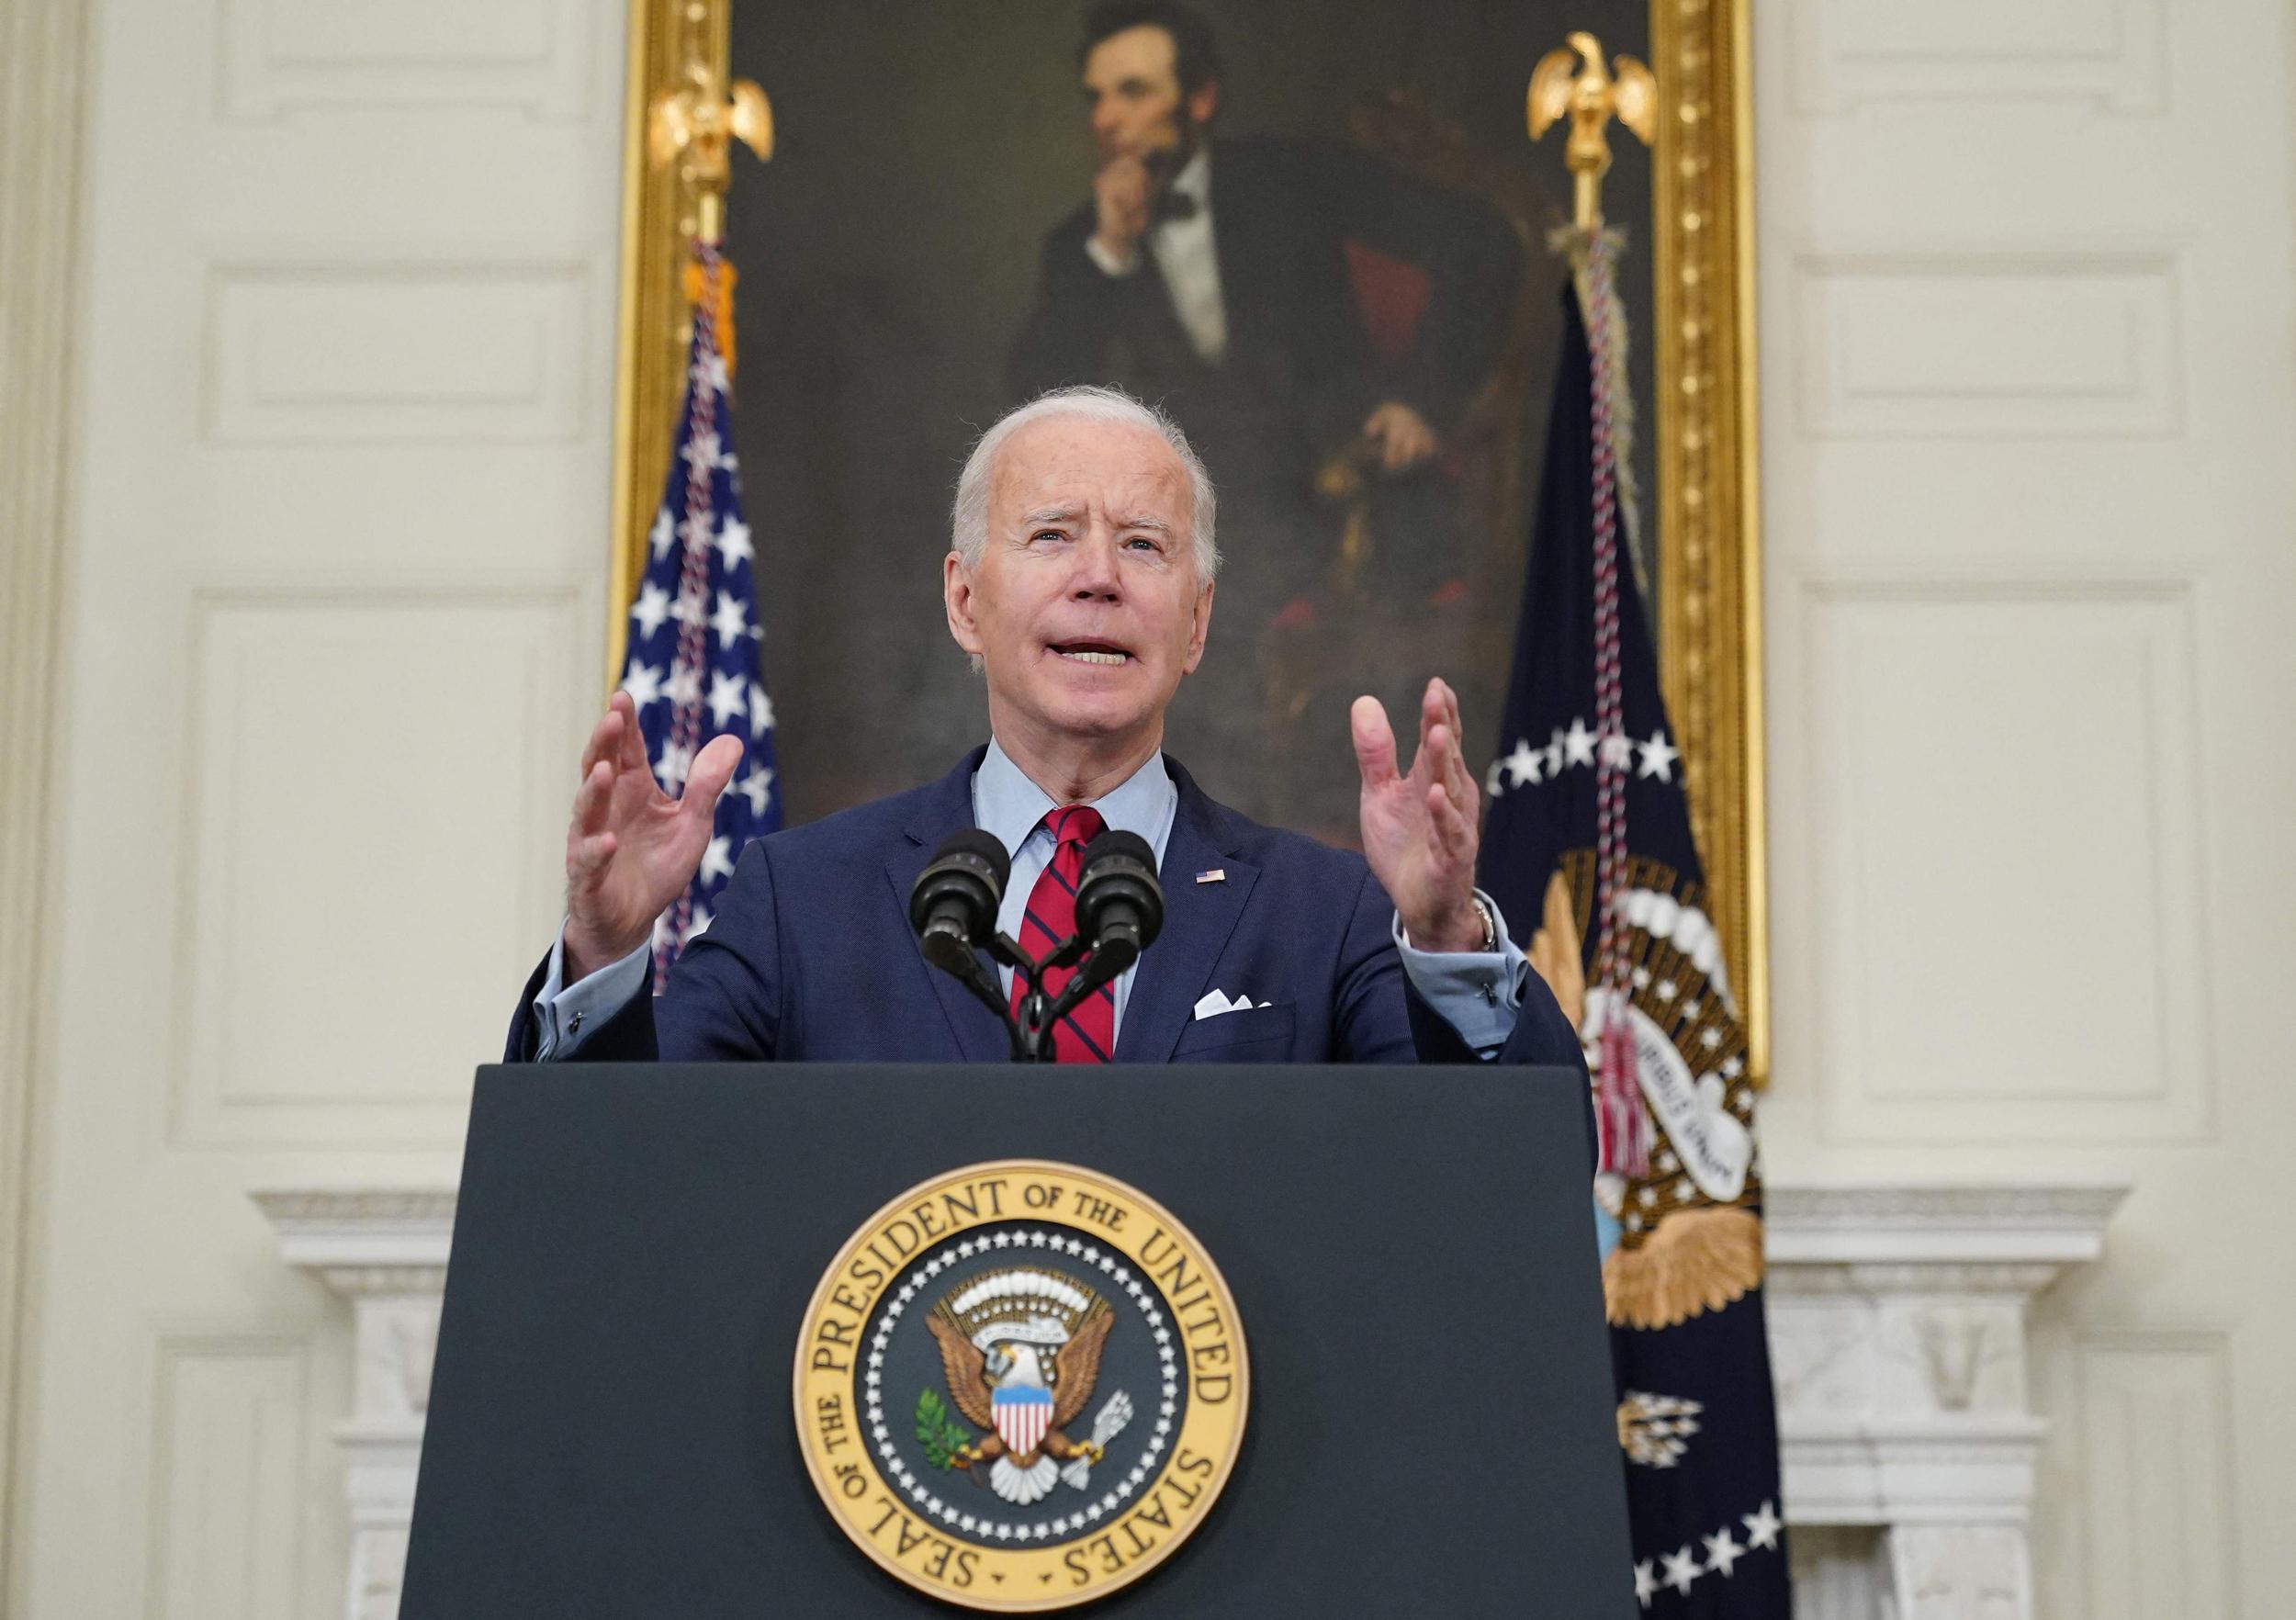 Biden Calls On Congress To Tighten Gun Laws In Wake Of Colorado Shooting That Killed 10